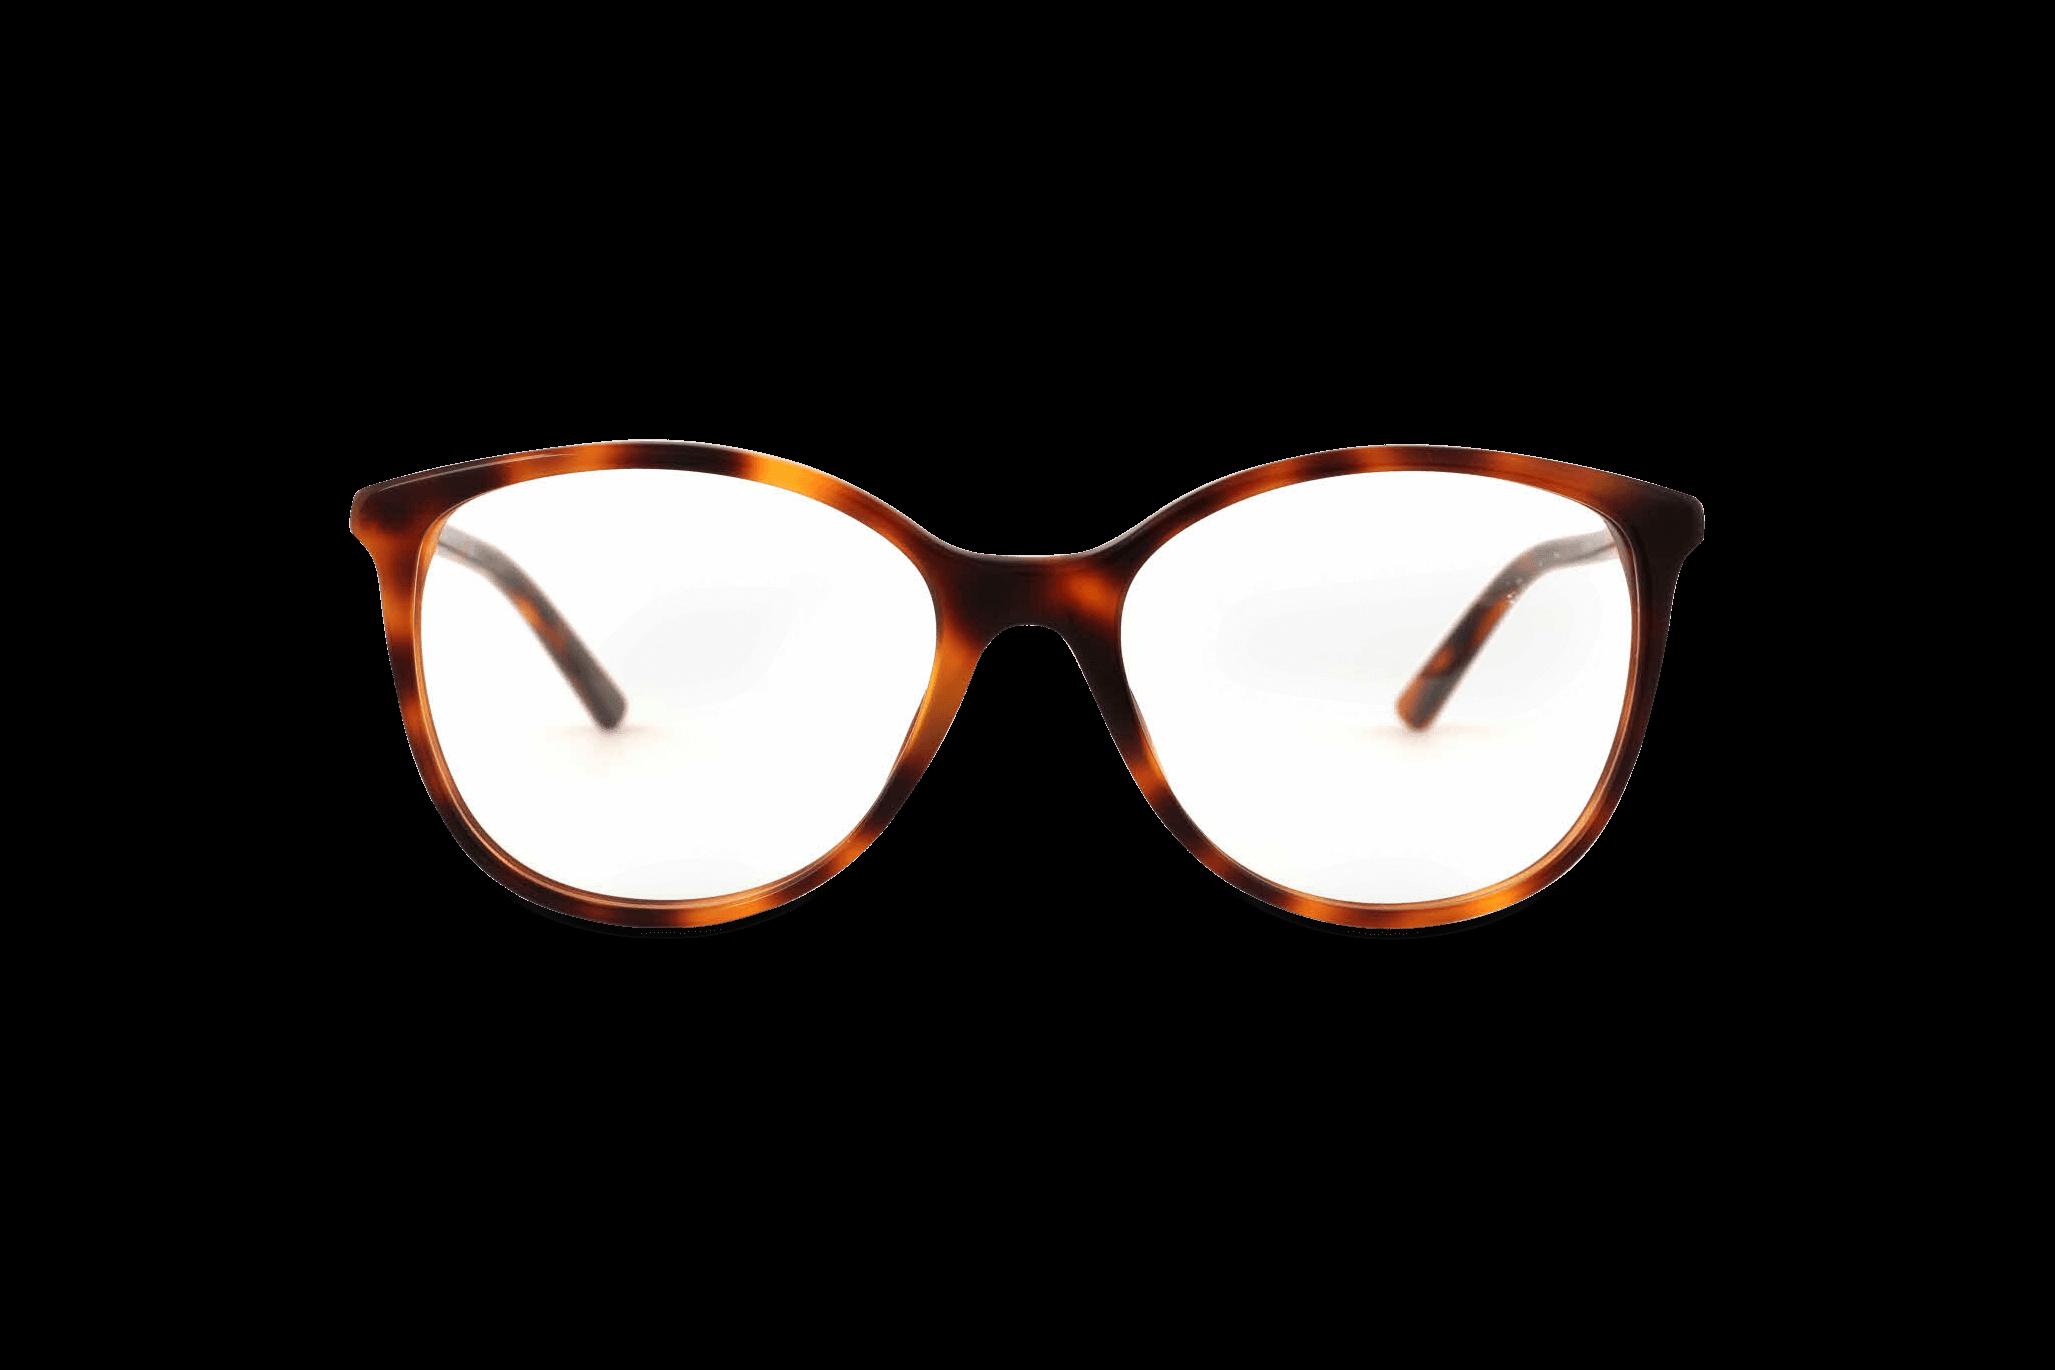 fc657e272ae Zenni Optical vs. SmartBuyGlasses Review — by Eyebasic